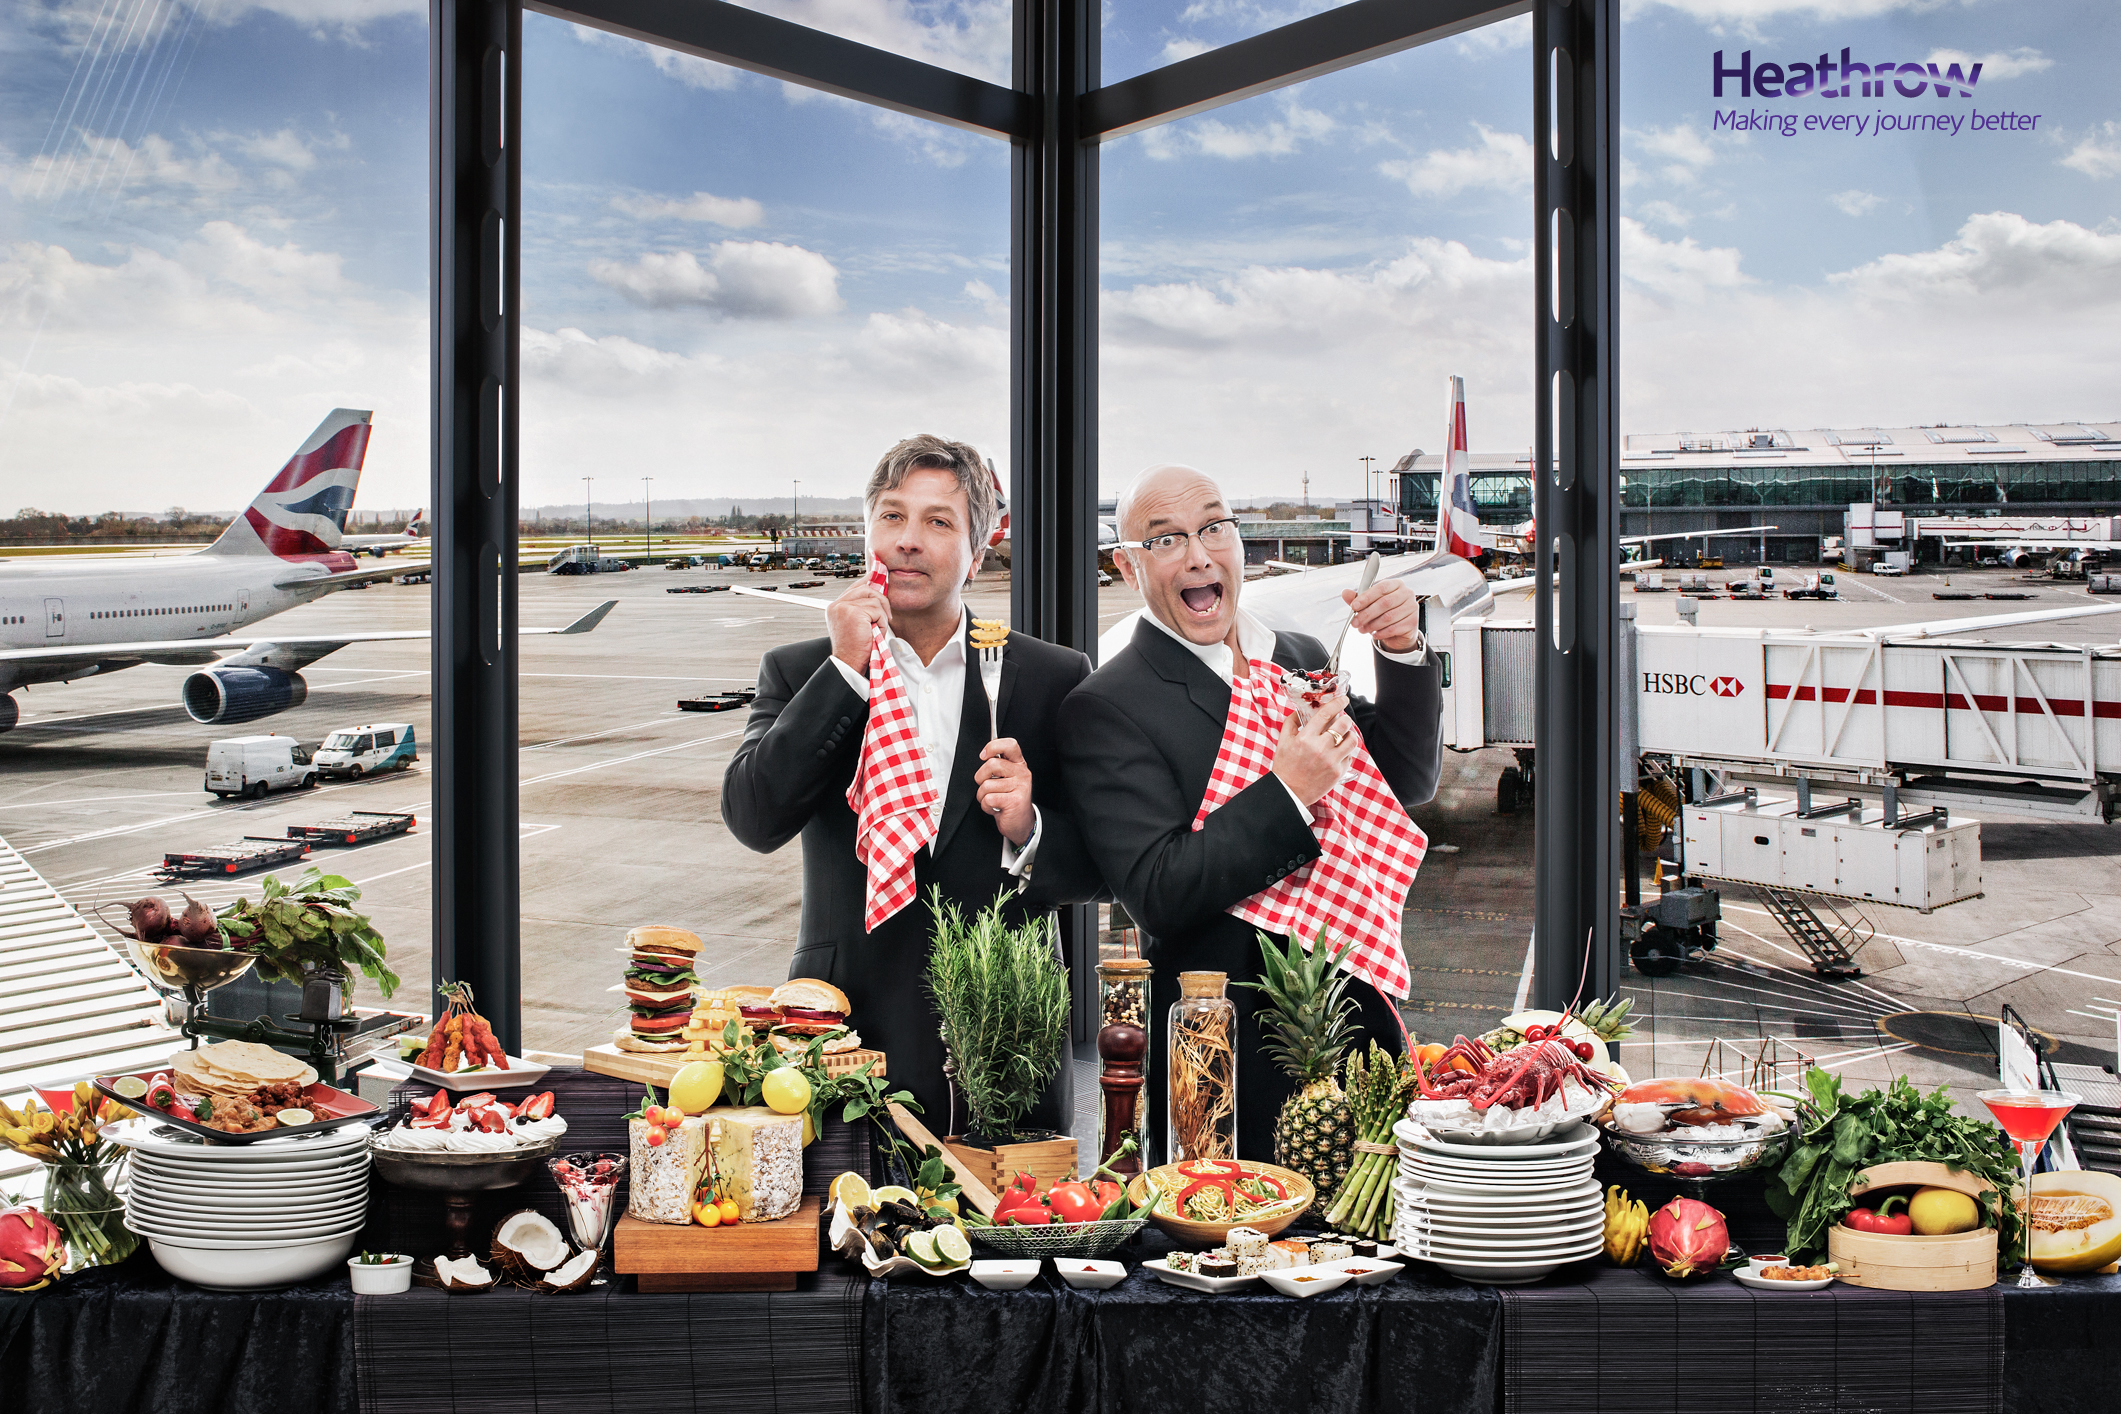 NPP_Heathrow_Landscape_3 copy.jpg